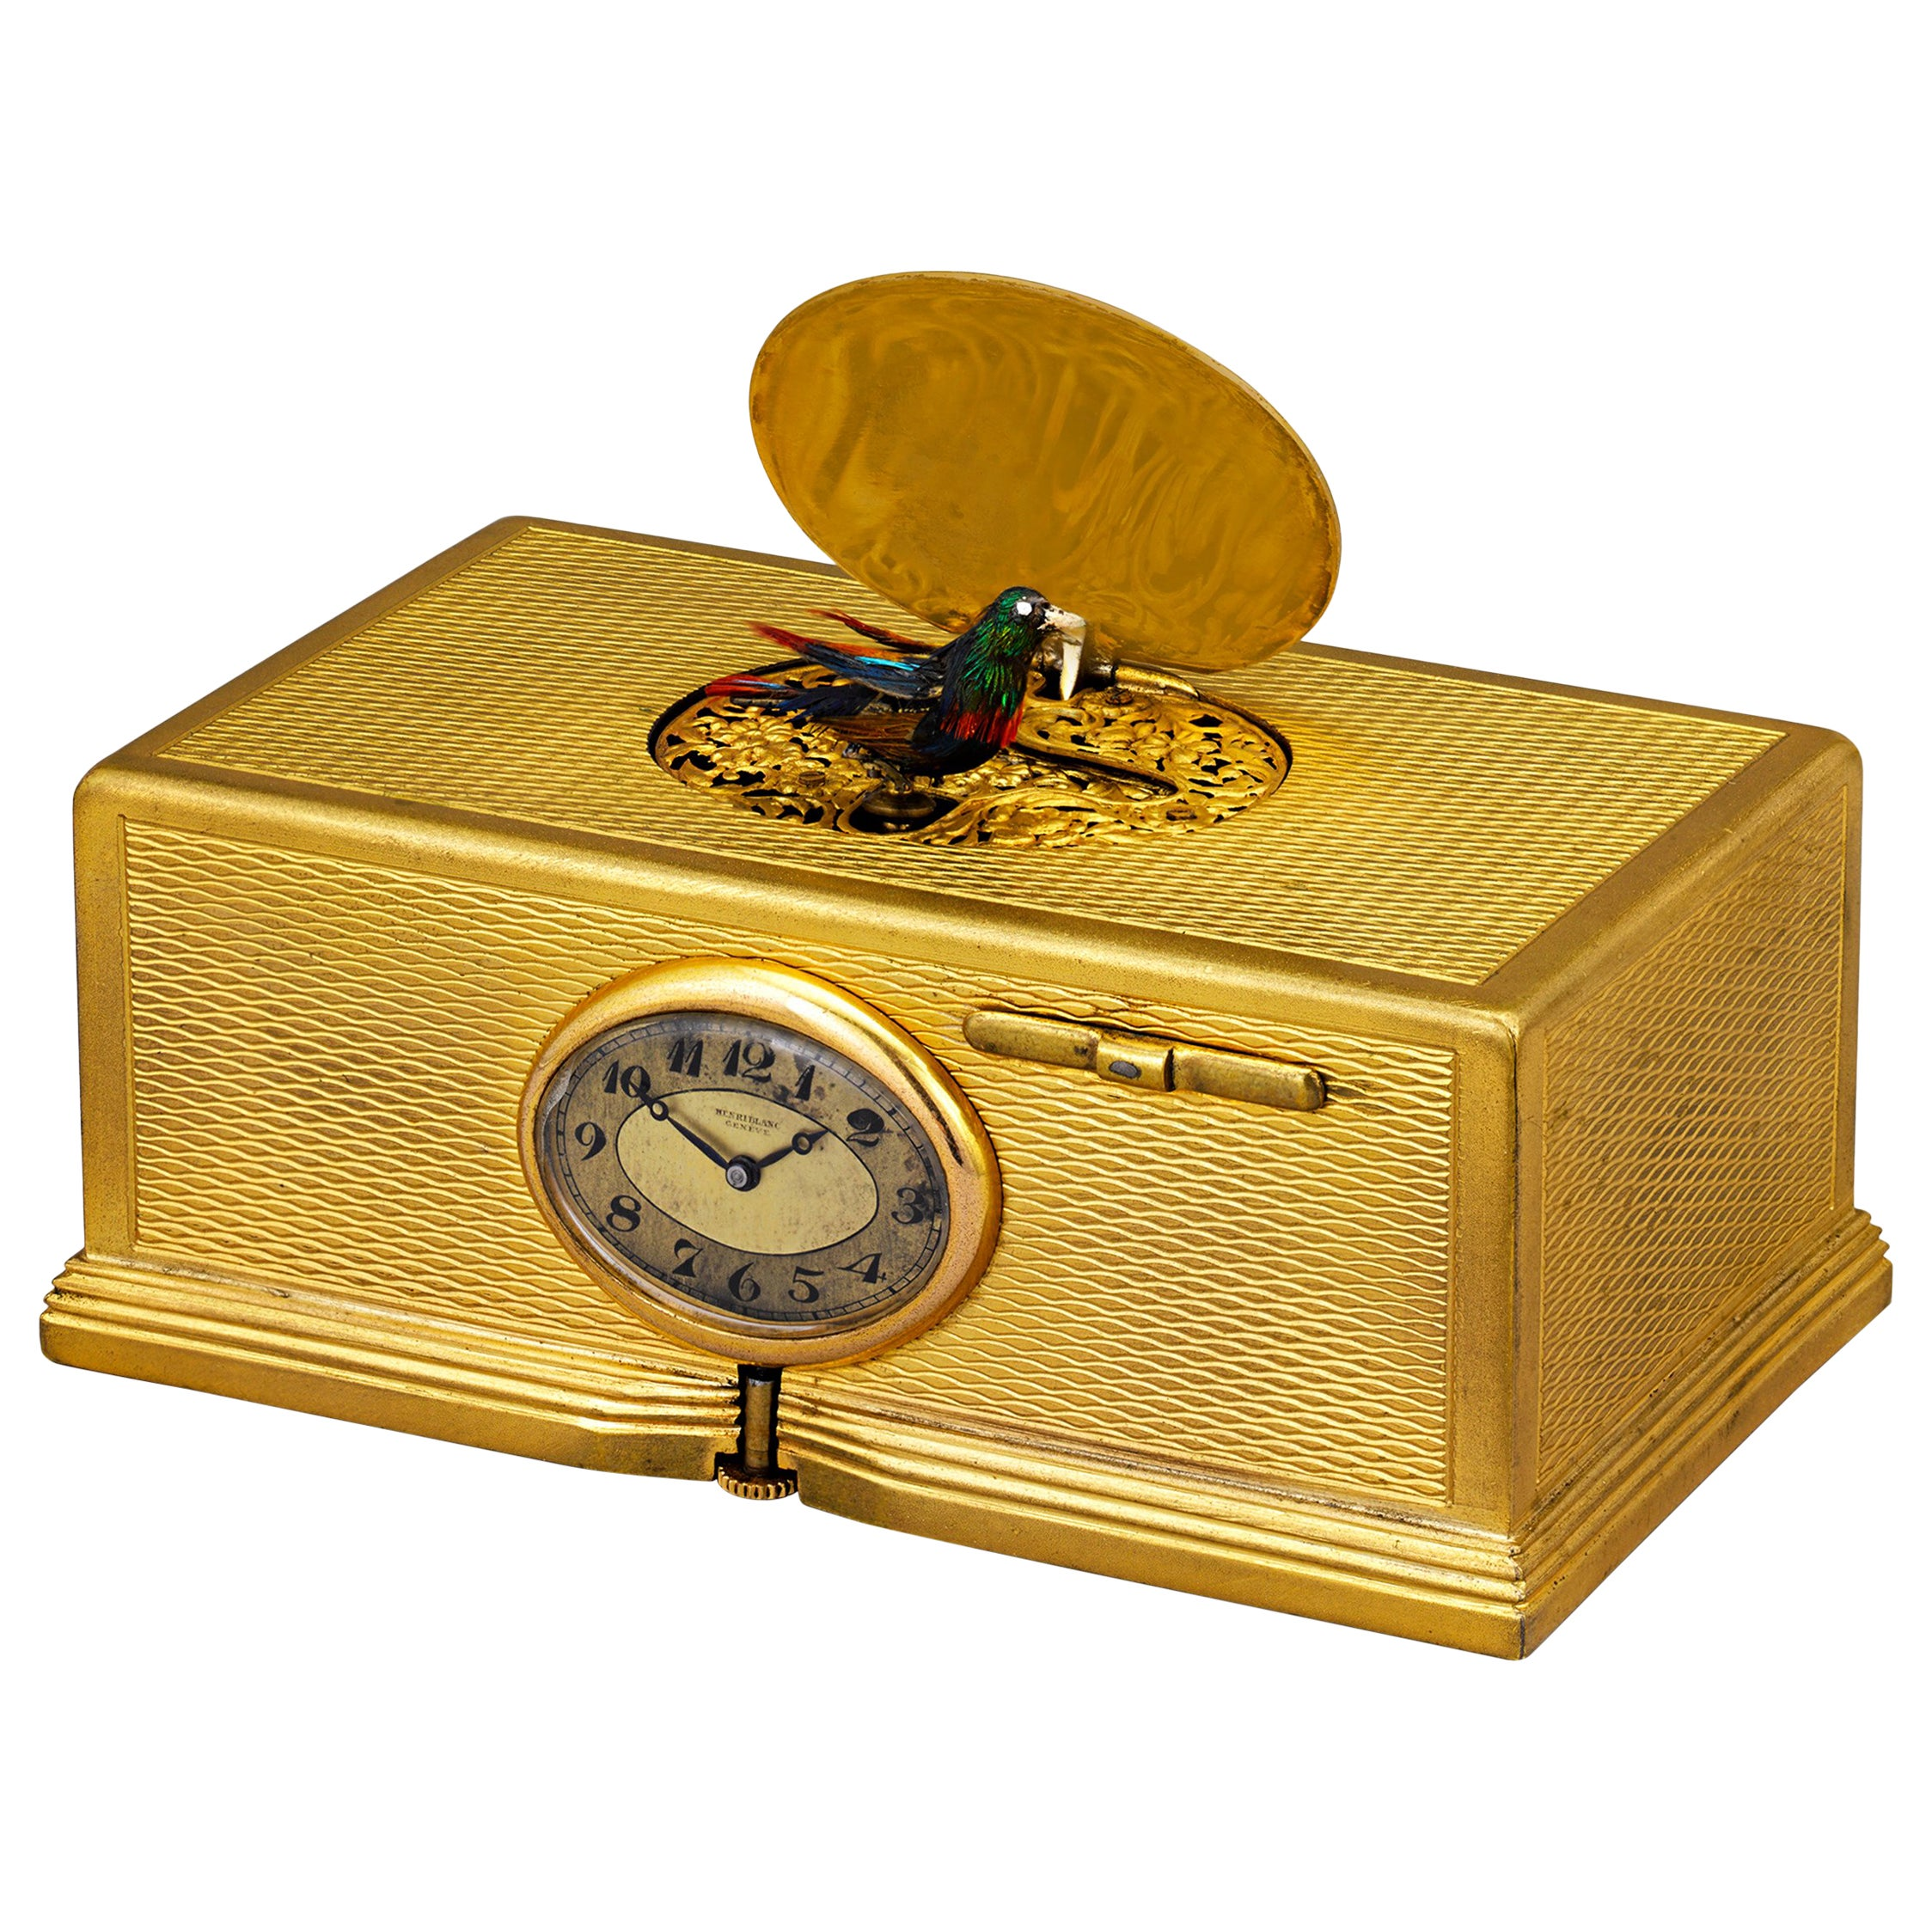 Gold-Plated Singing Bird Box and Clock